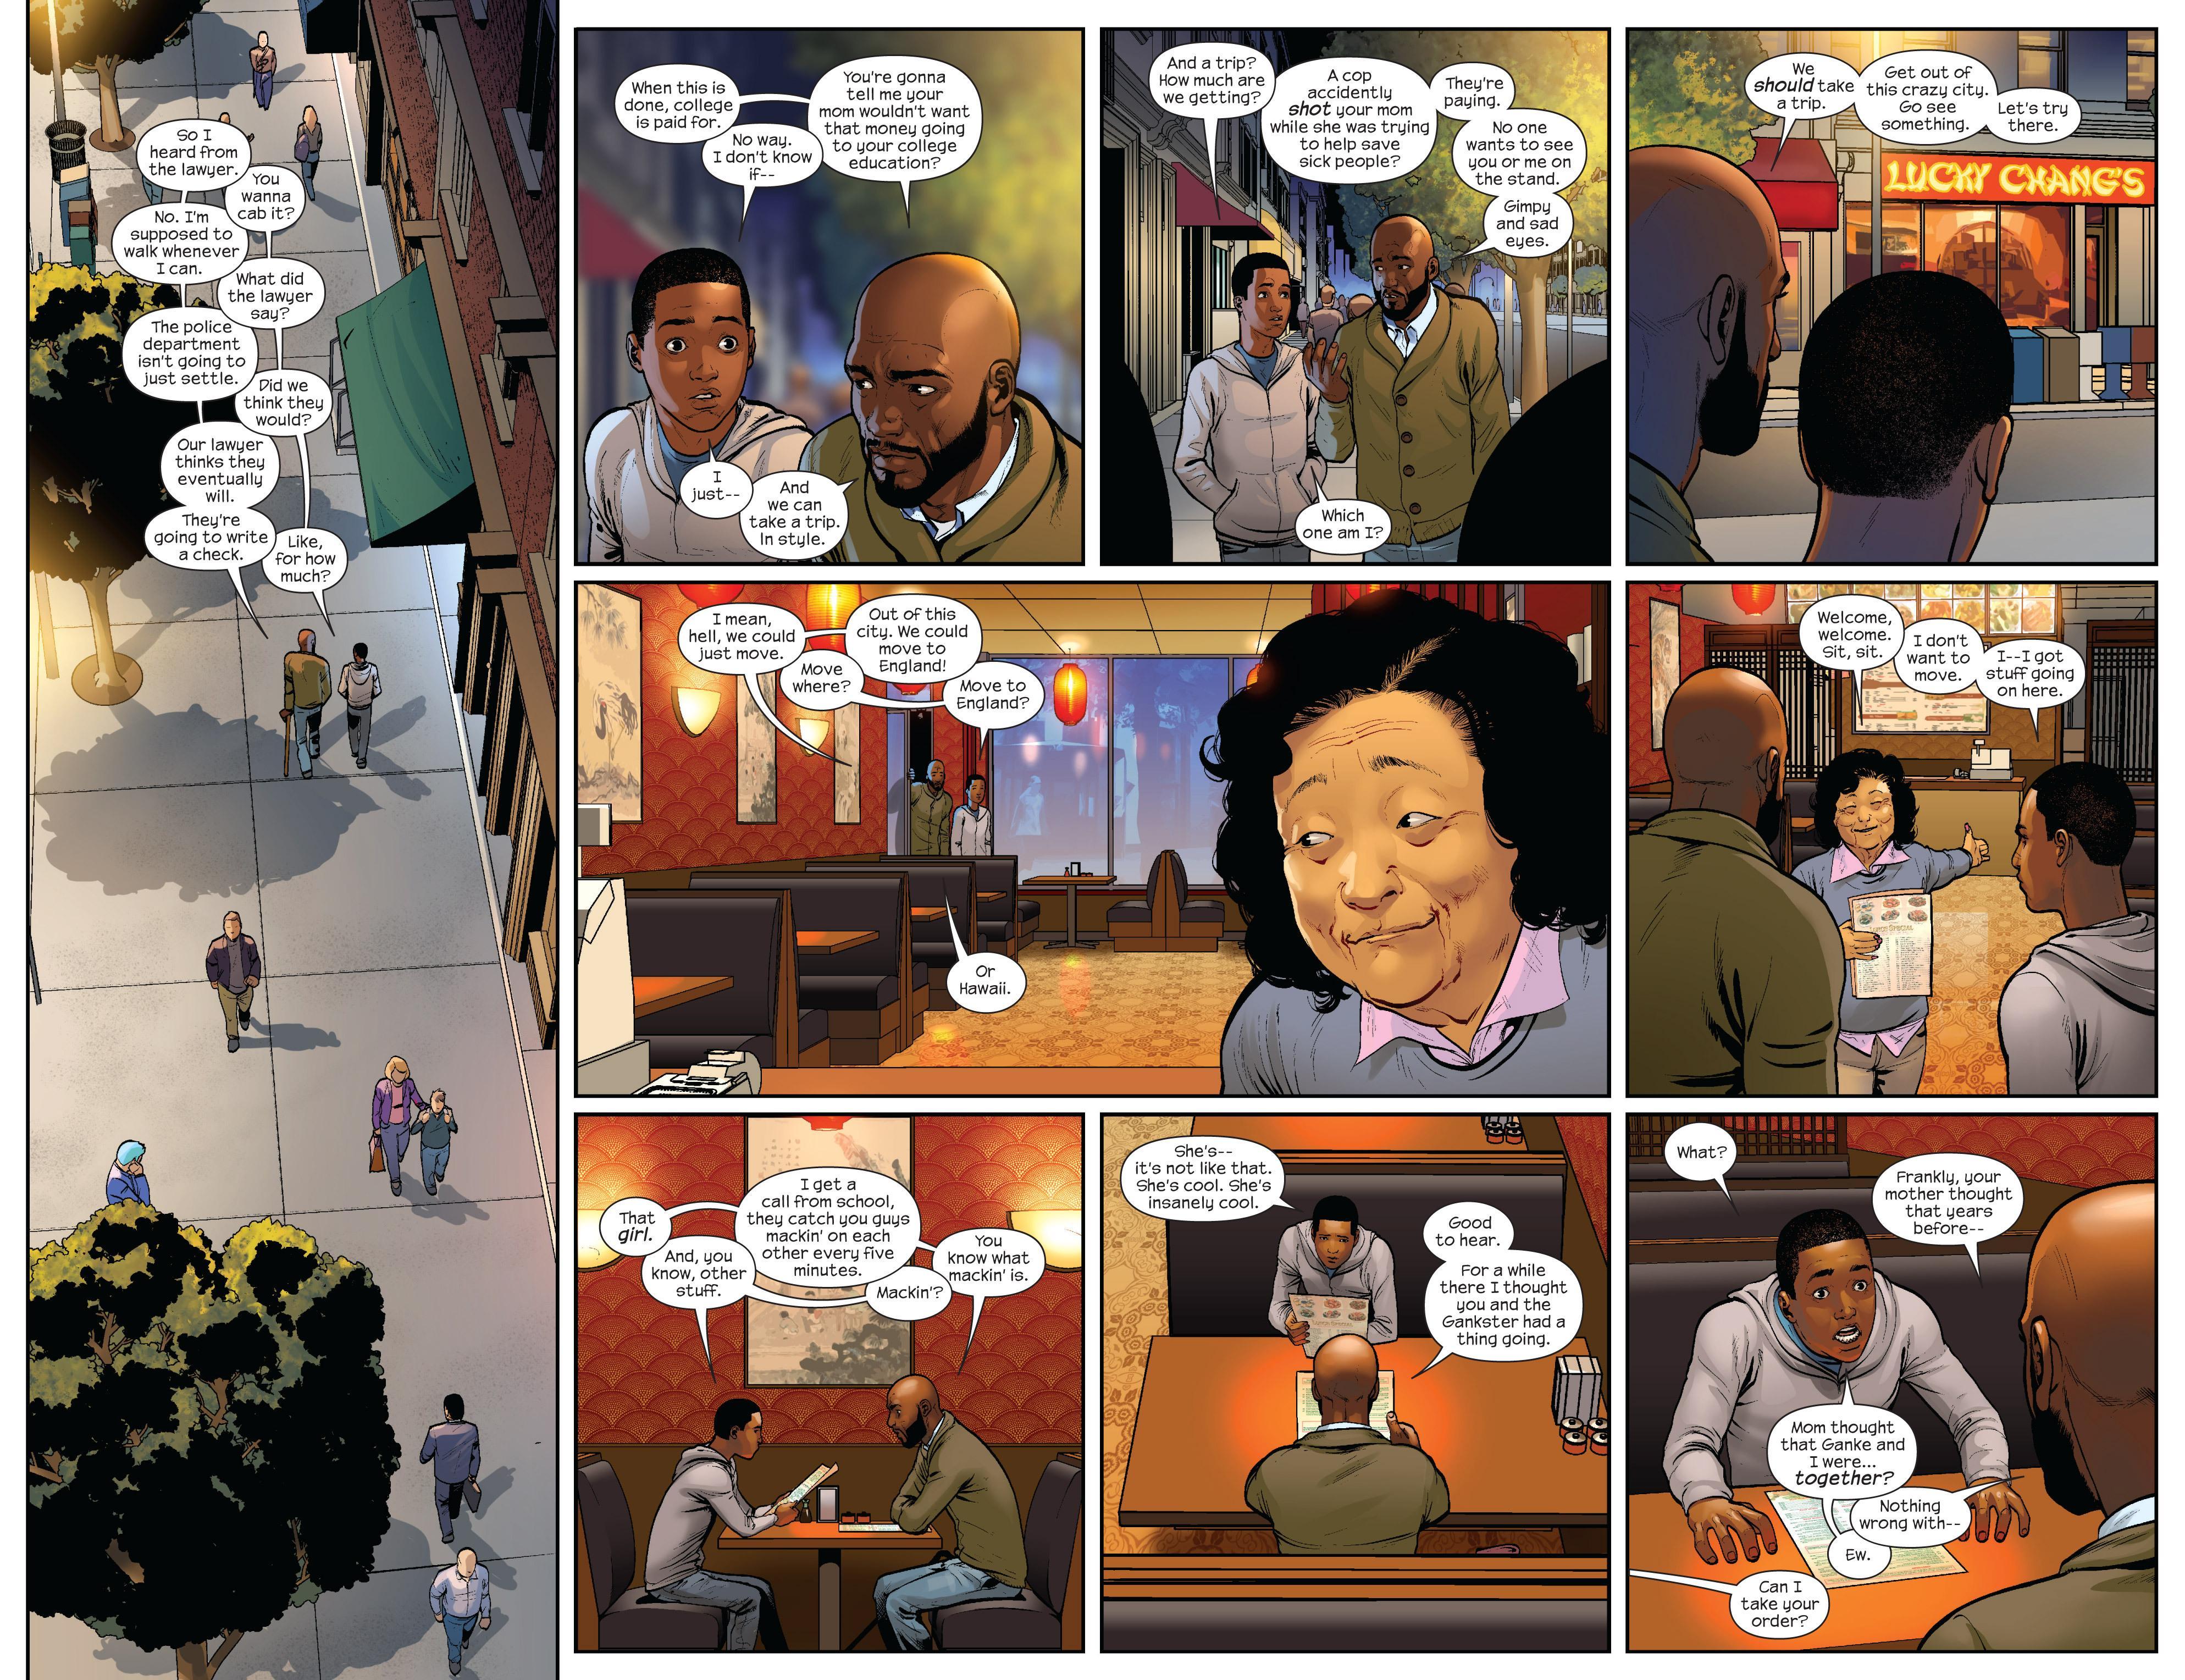 Ultimate Comics Spider-Man V5 review